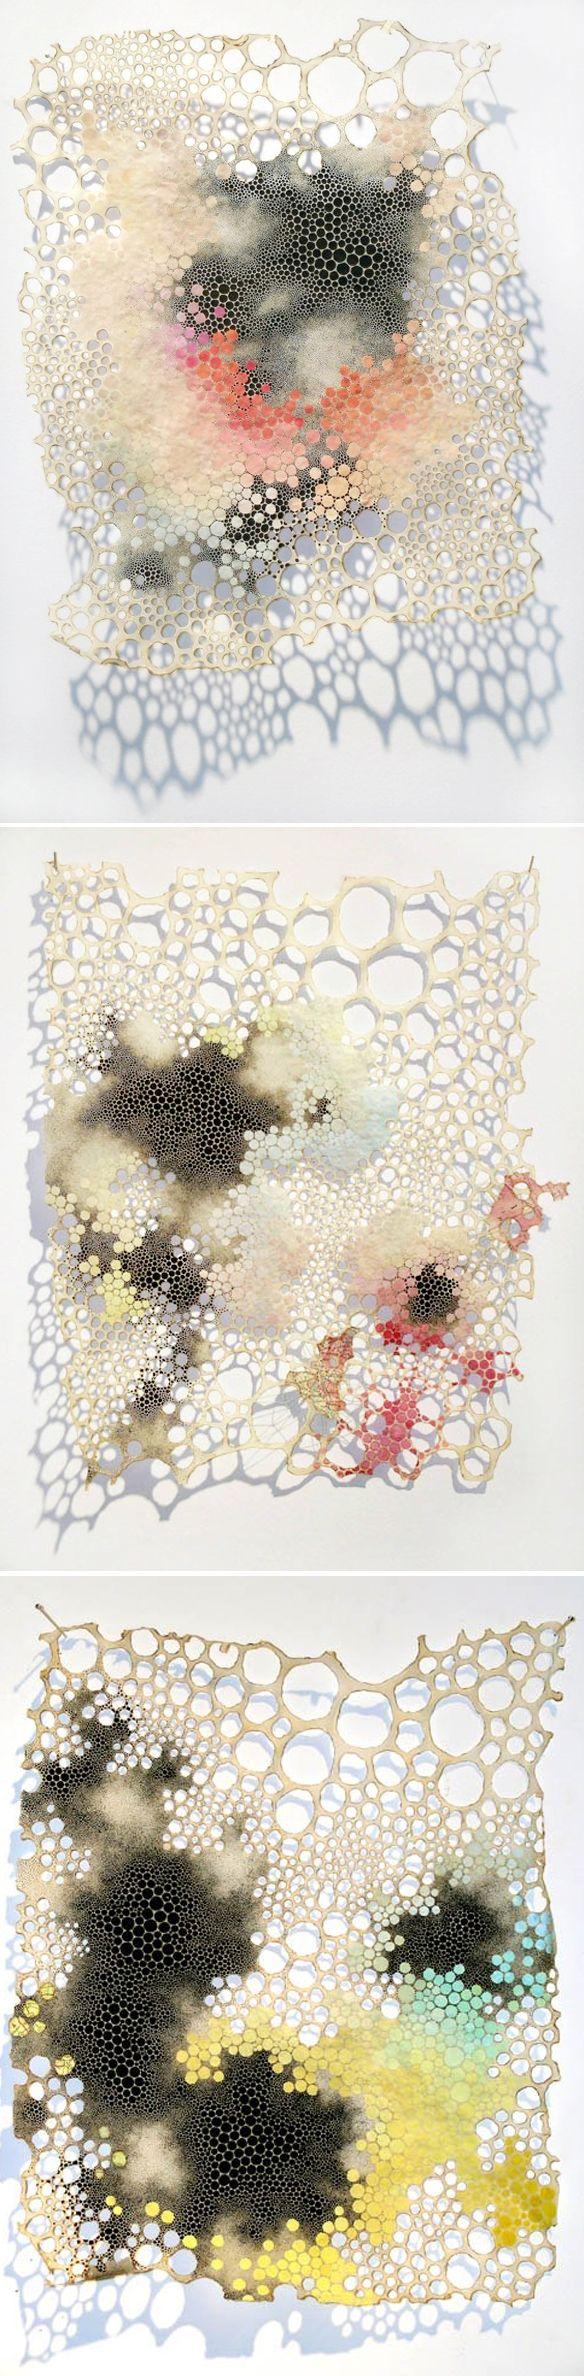 Karen Margolis The Jealous Curator Contemporary Art Art Paper Art